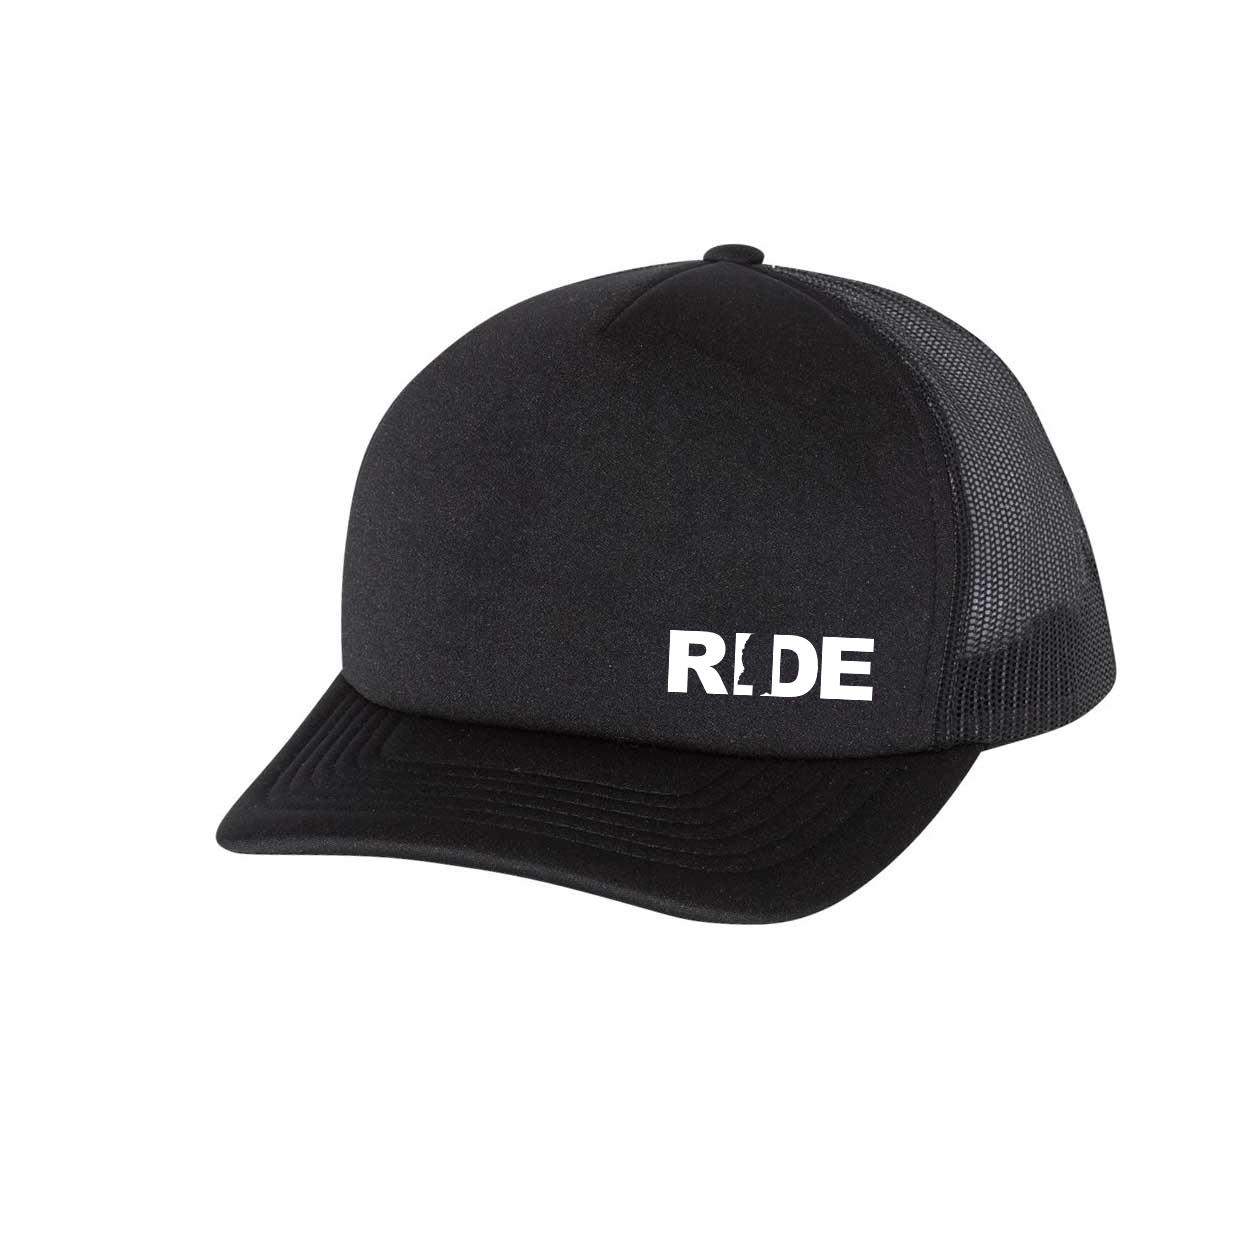 Ride Mississippi Night Out Premium Foam Trucker Snapback Hat Black (White Logo)